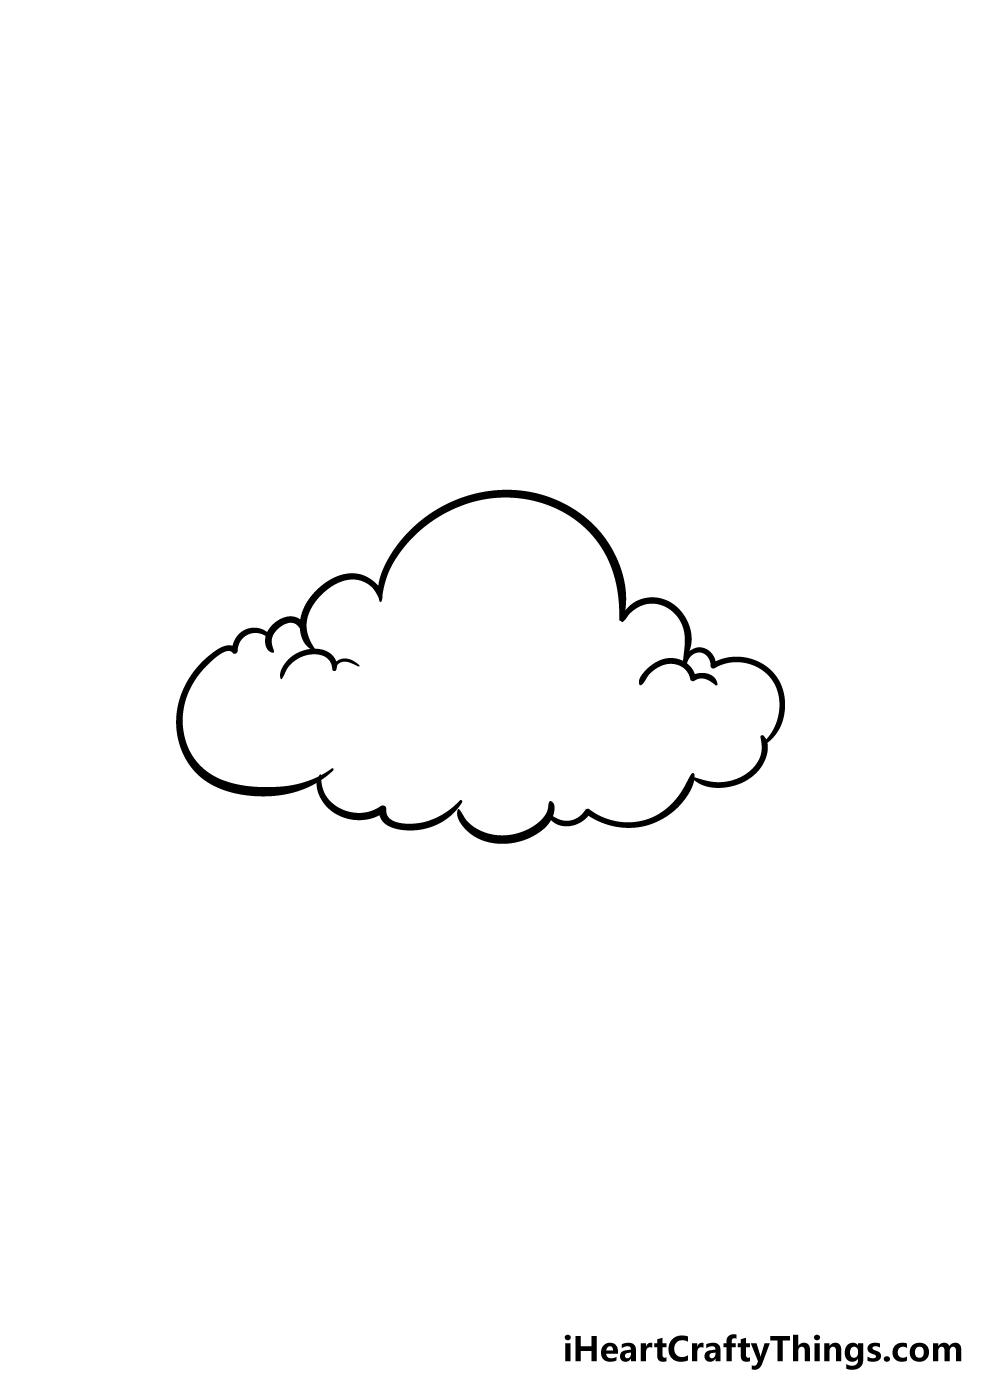 cloud drawing step 5